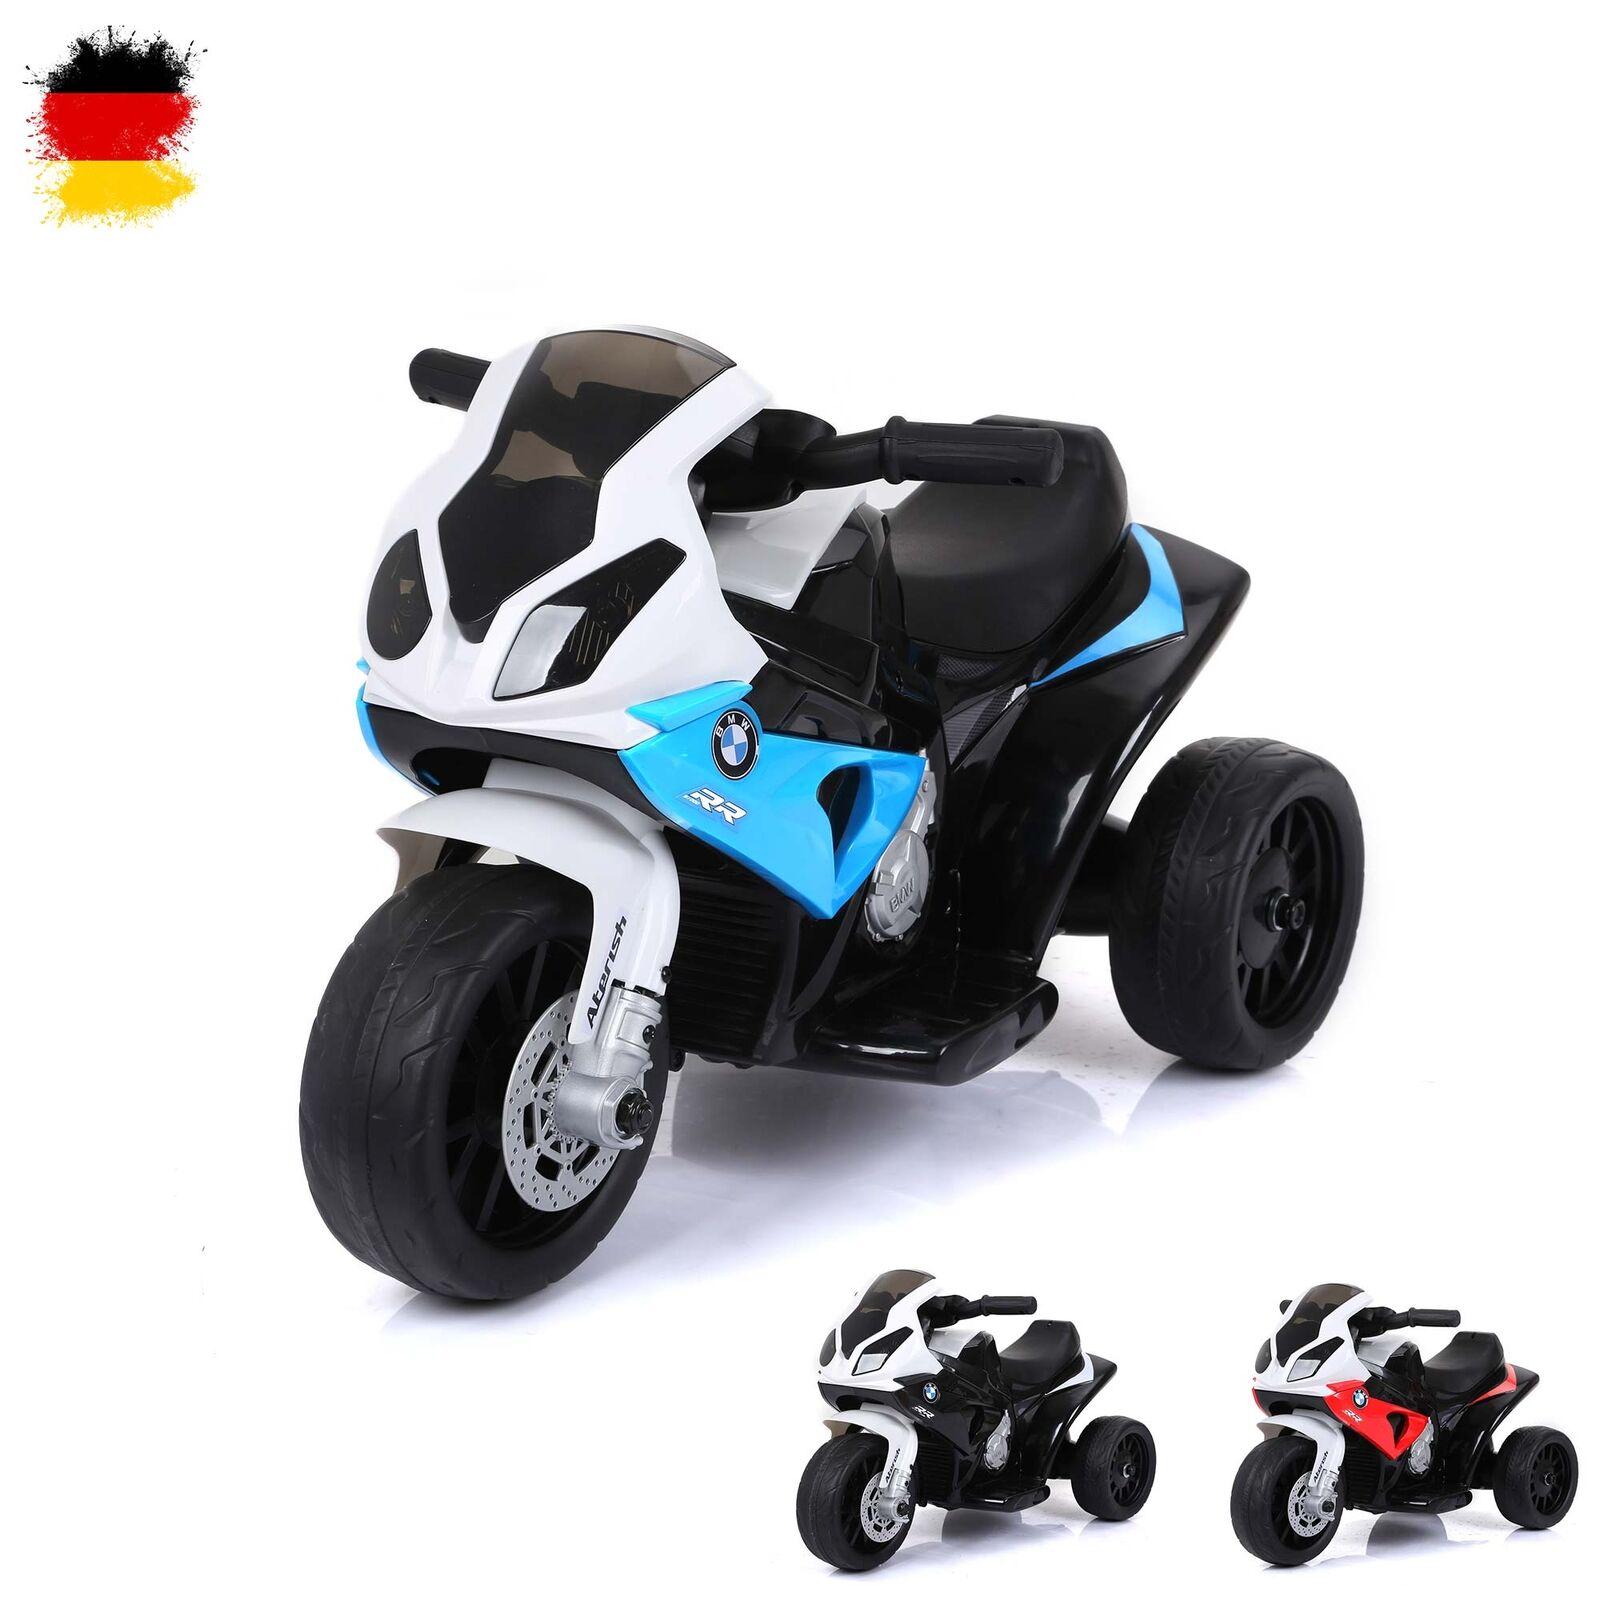 Original BMW S1000RR Kinder Elektro-Motorrad Elektroauto Auto Roller Scooter